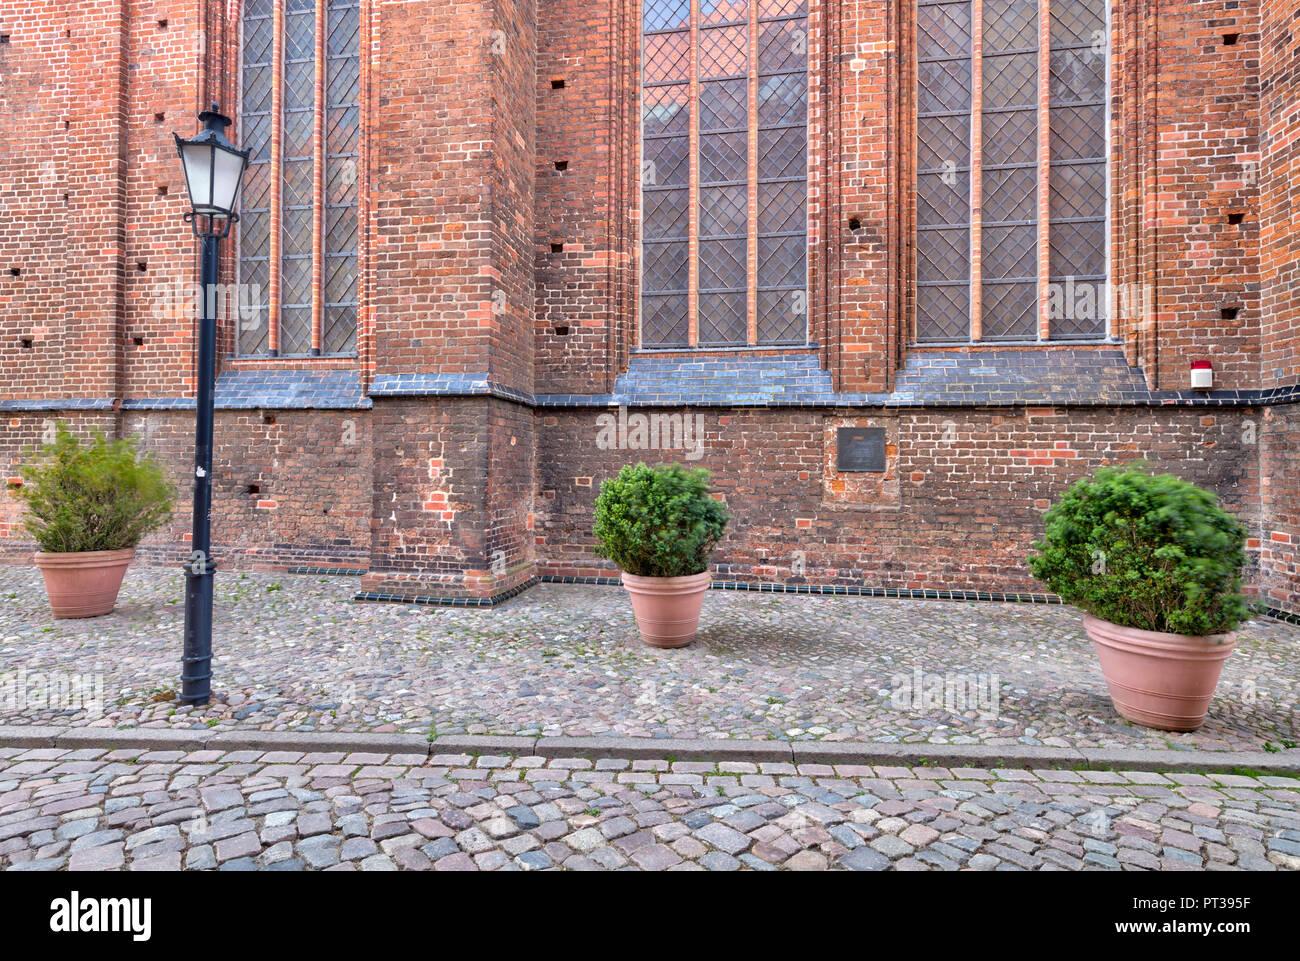 St. Georgen Church, Wismar, Baltic Sea coast, Mecklenburg-Vorpommern, Germany, Europe - Stock Image